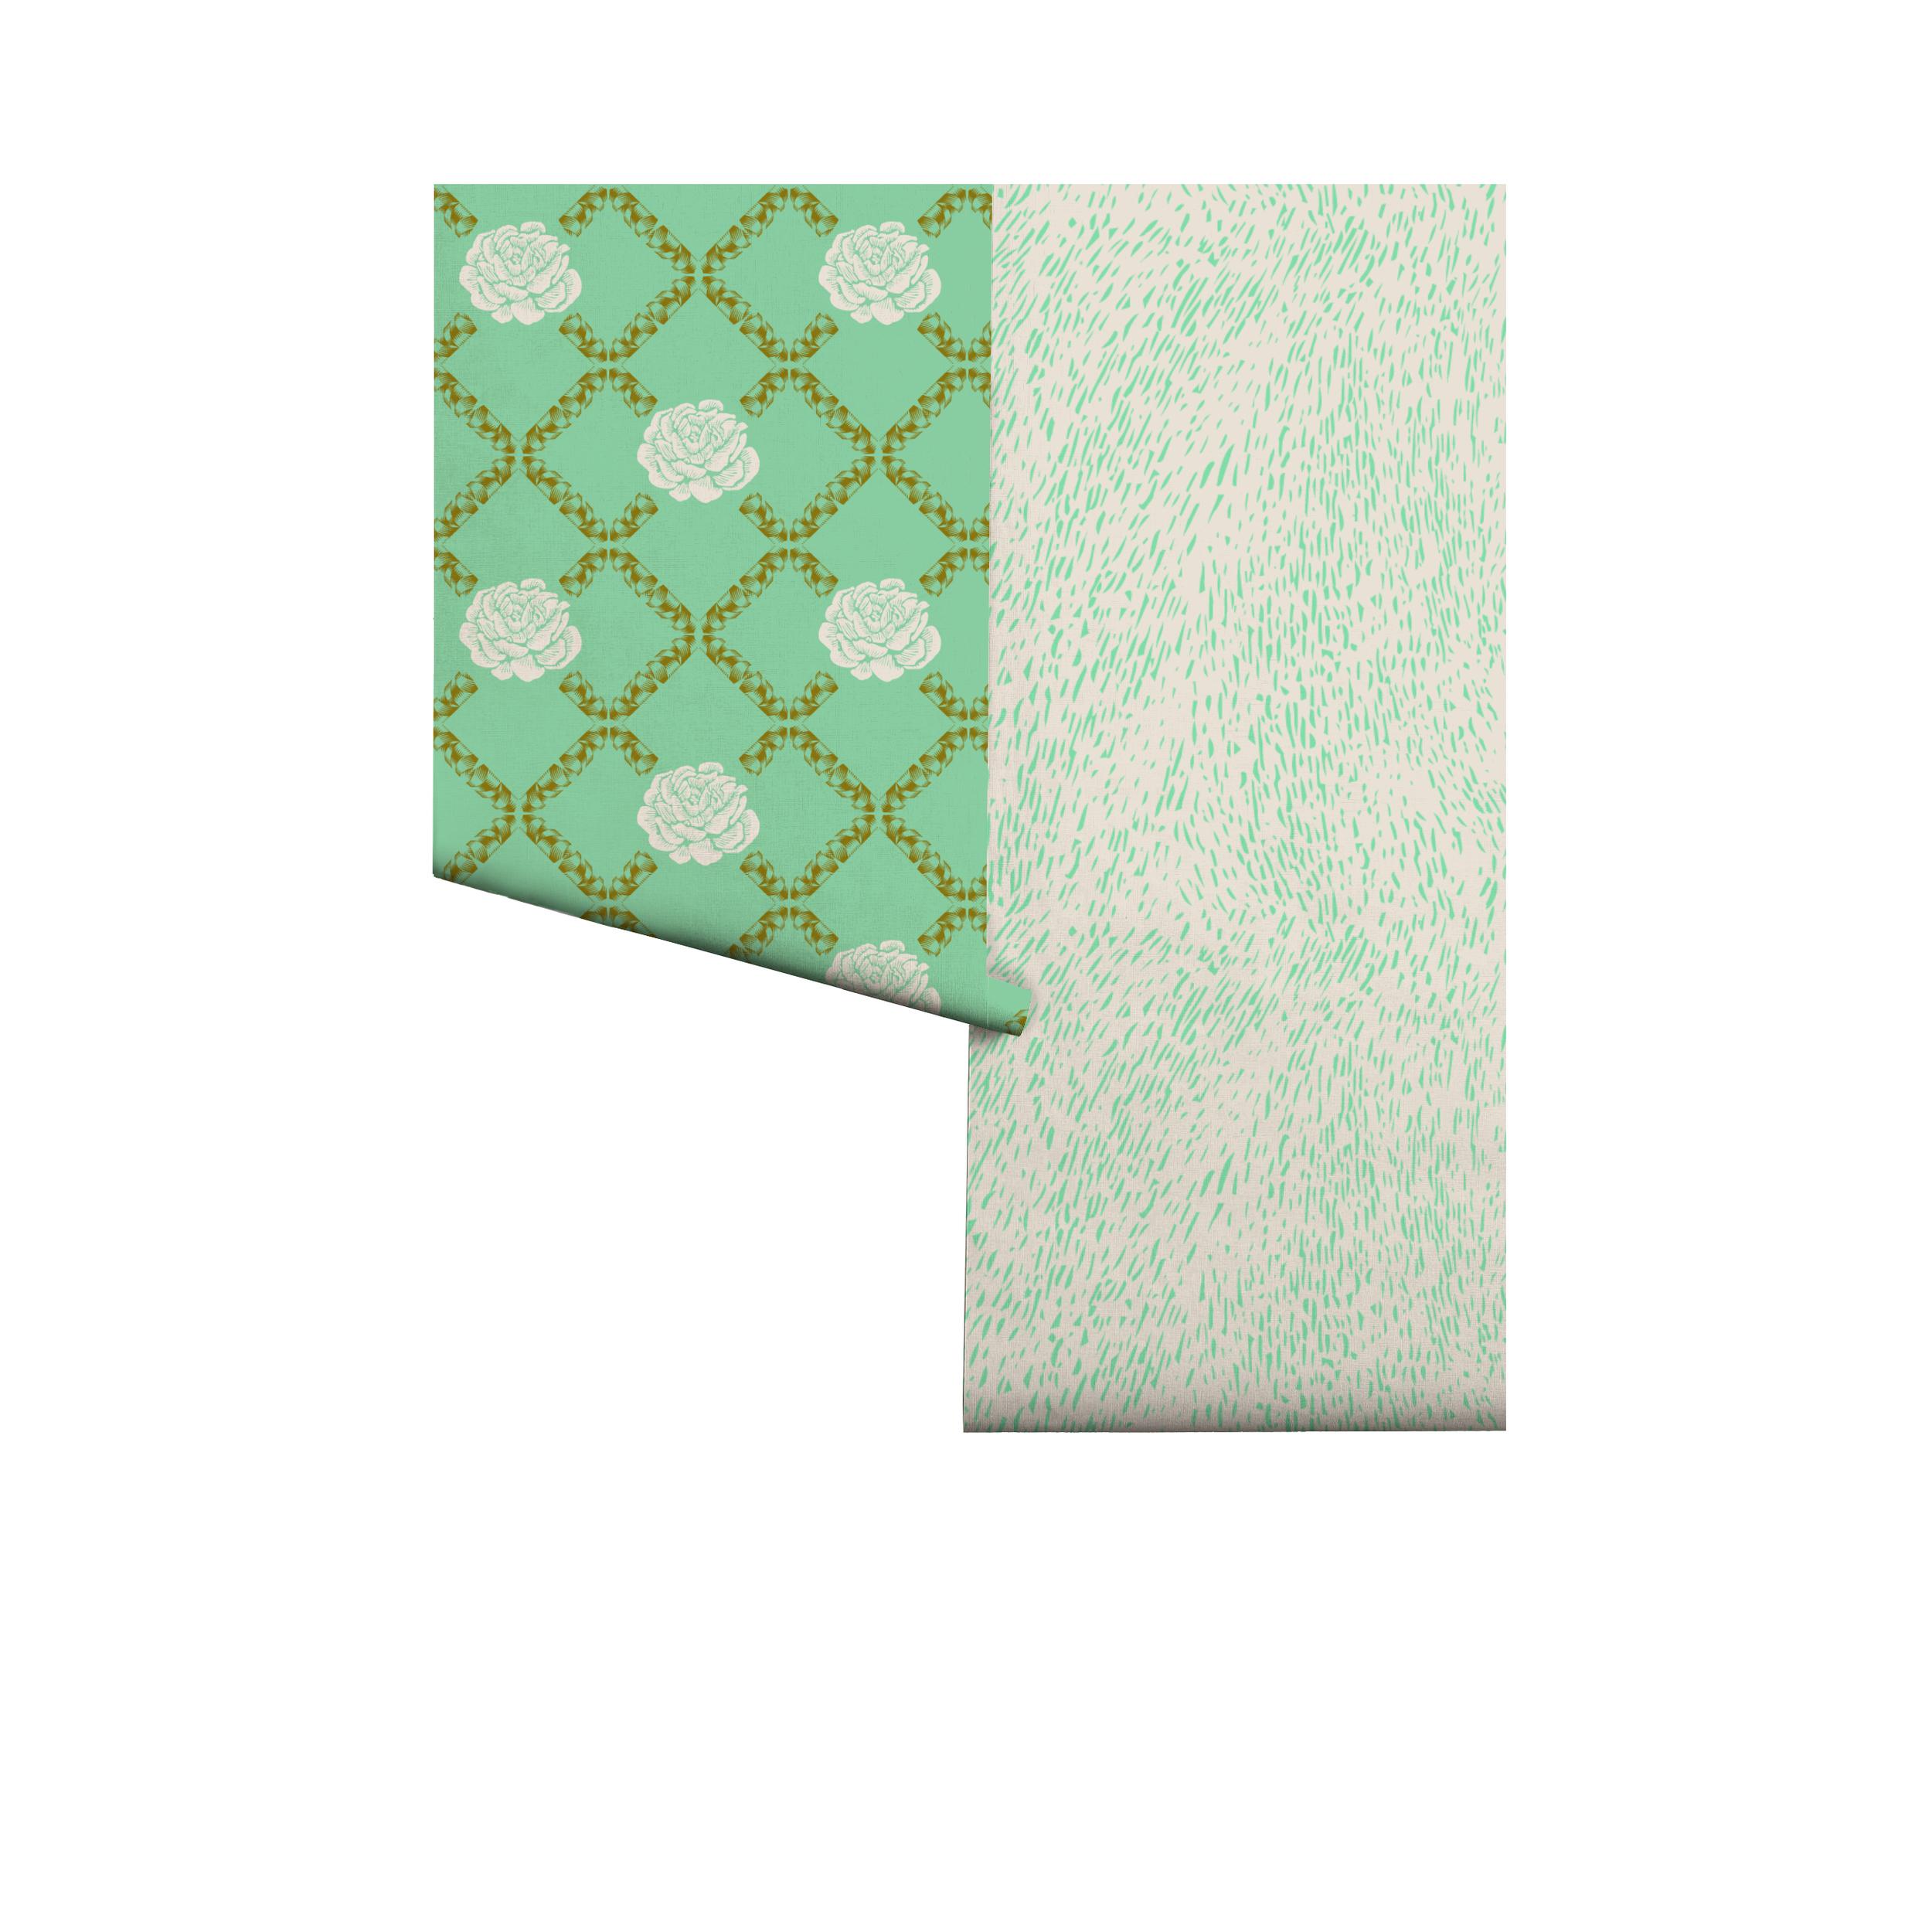 wall-paper-kelly lattice+bark.jpg